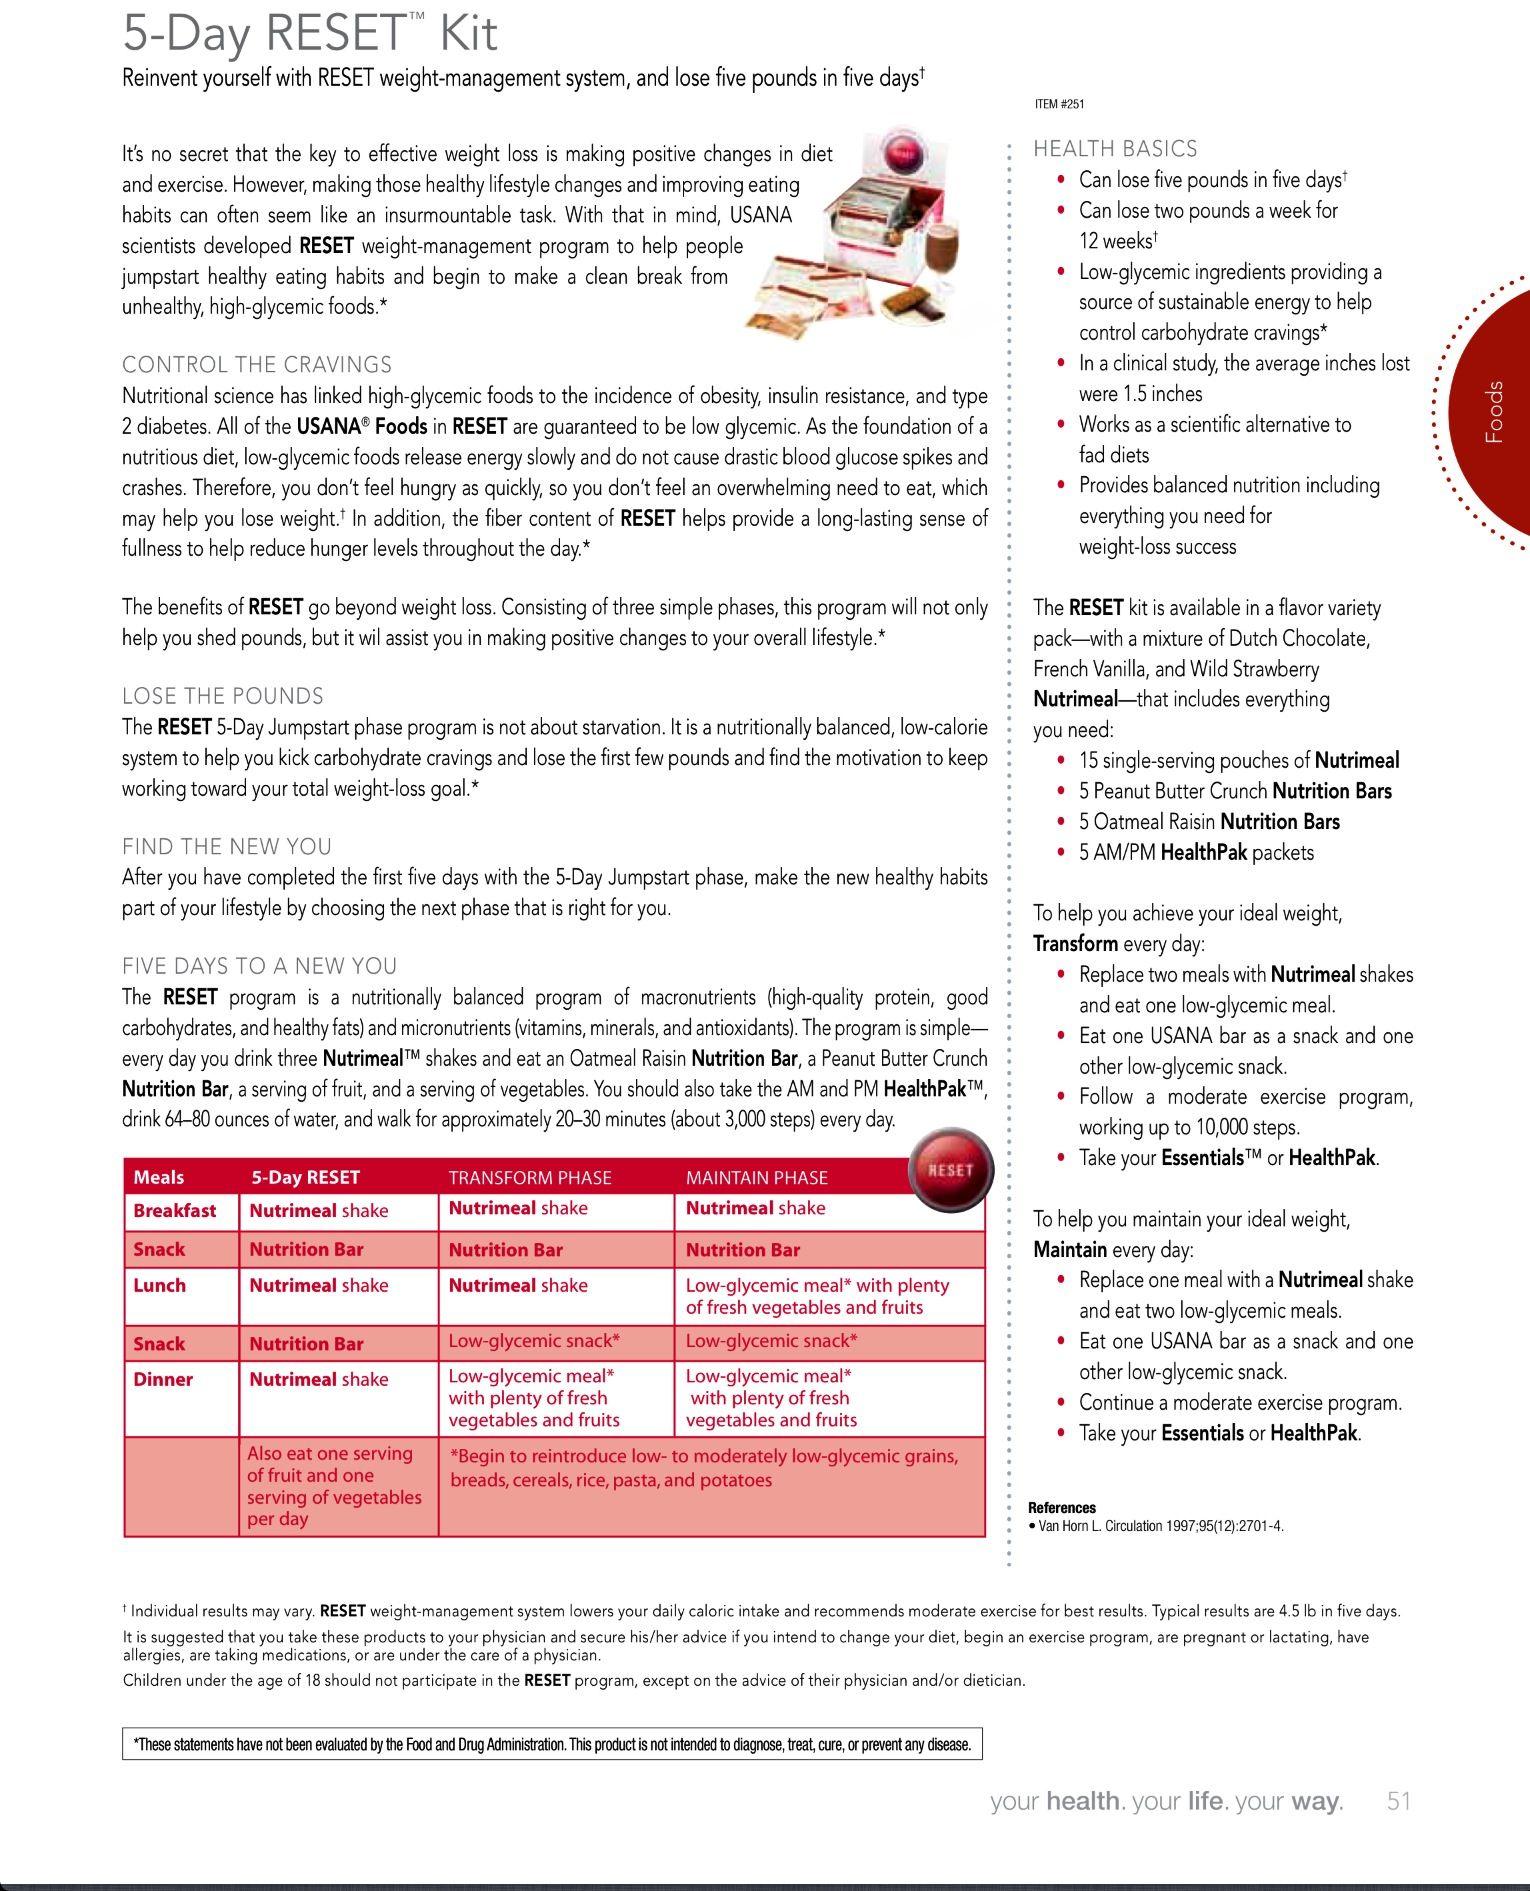 $383.94 RESET Transform Kit includes: USANA® Essentials™ Green Rev3 energy Surge Pack (